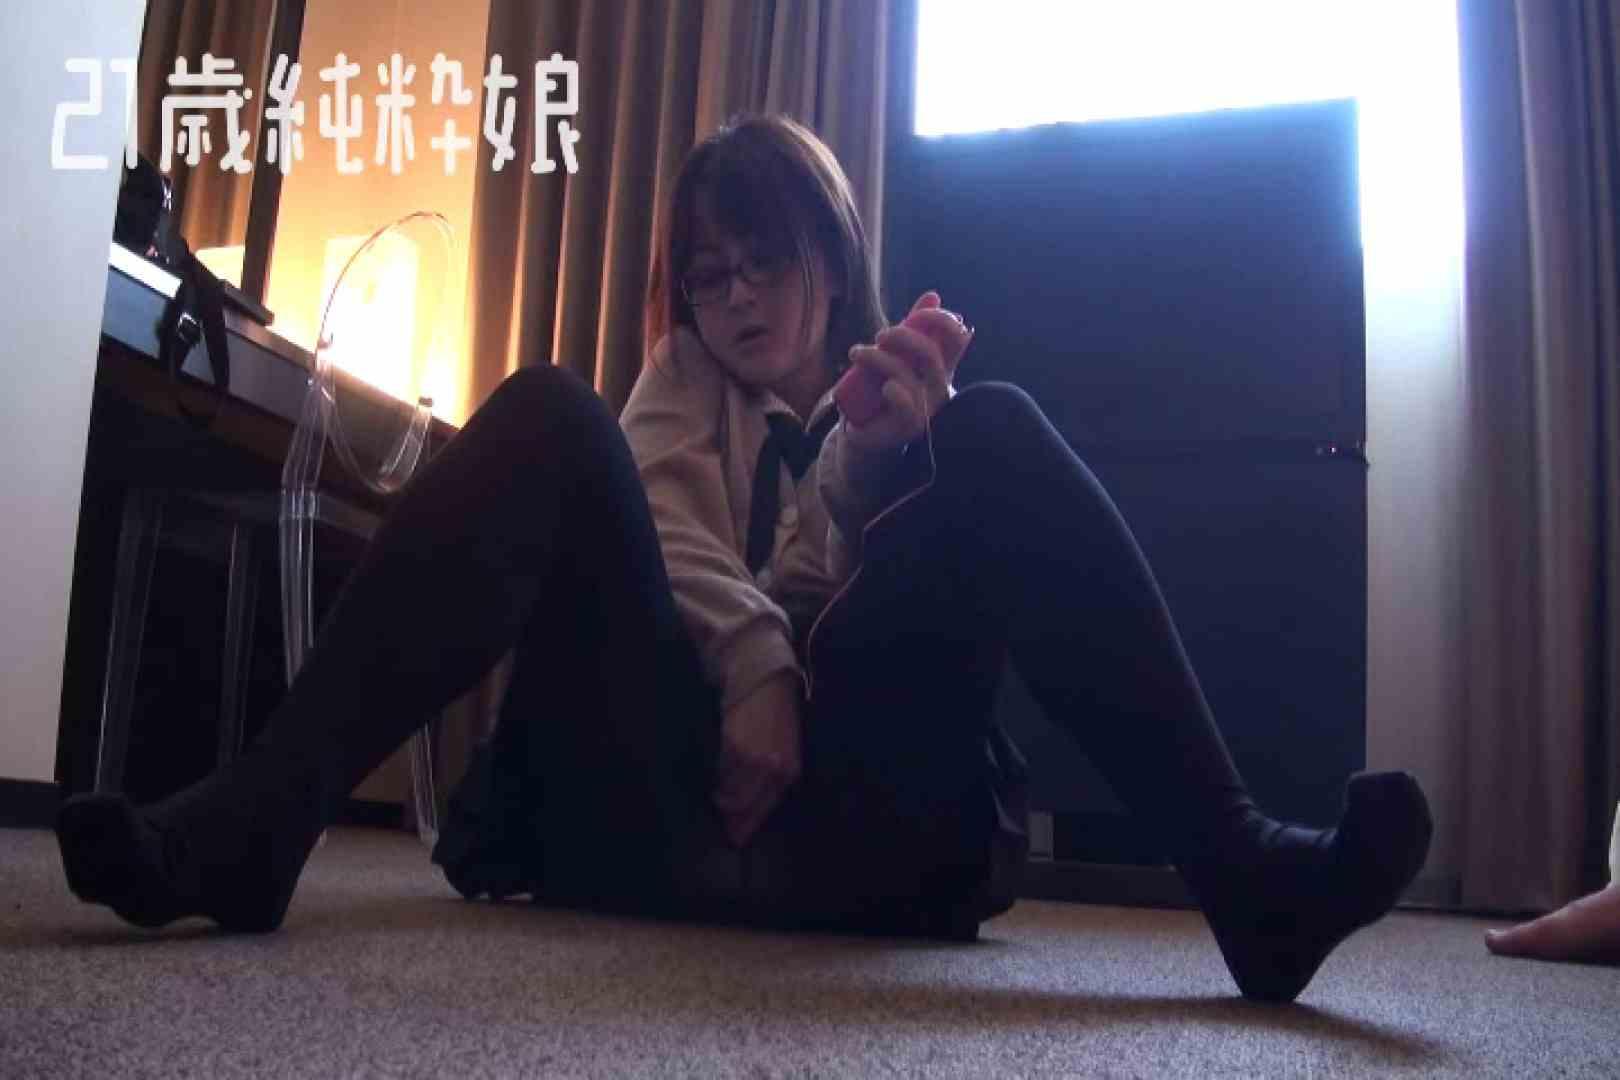 Gカップ21歳純粋嬢第2弾Vol.3 性欲 盗撮動画紹介 71pic 8